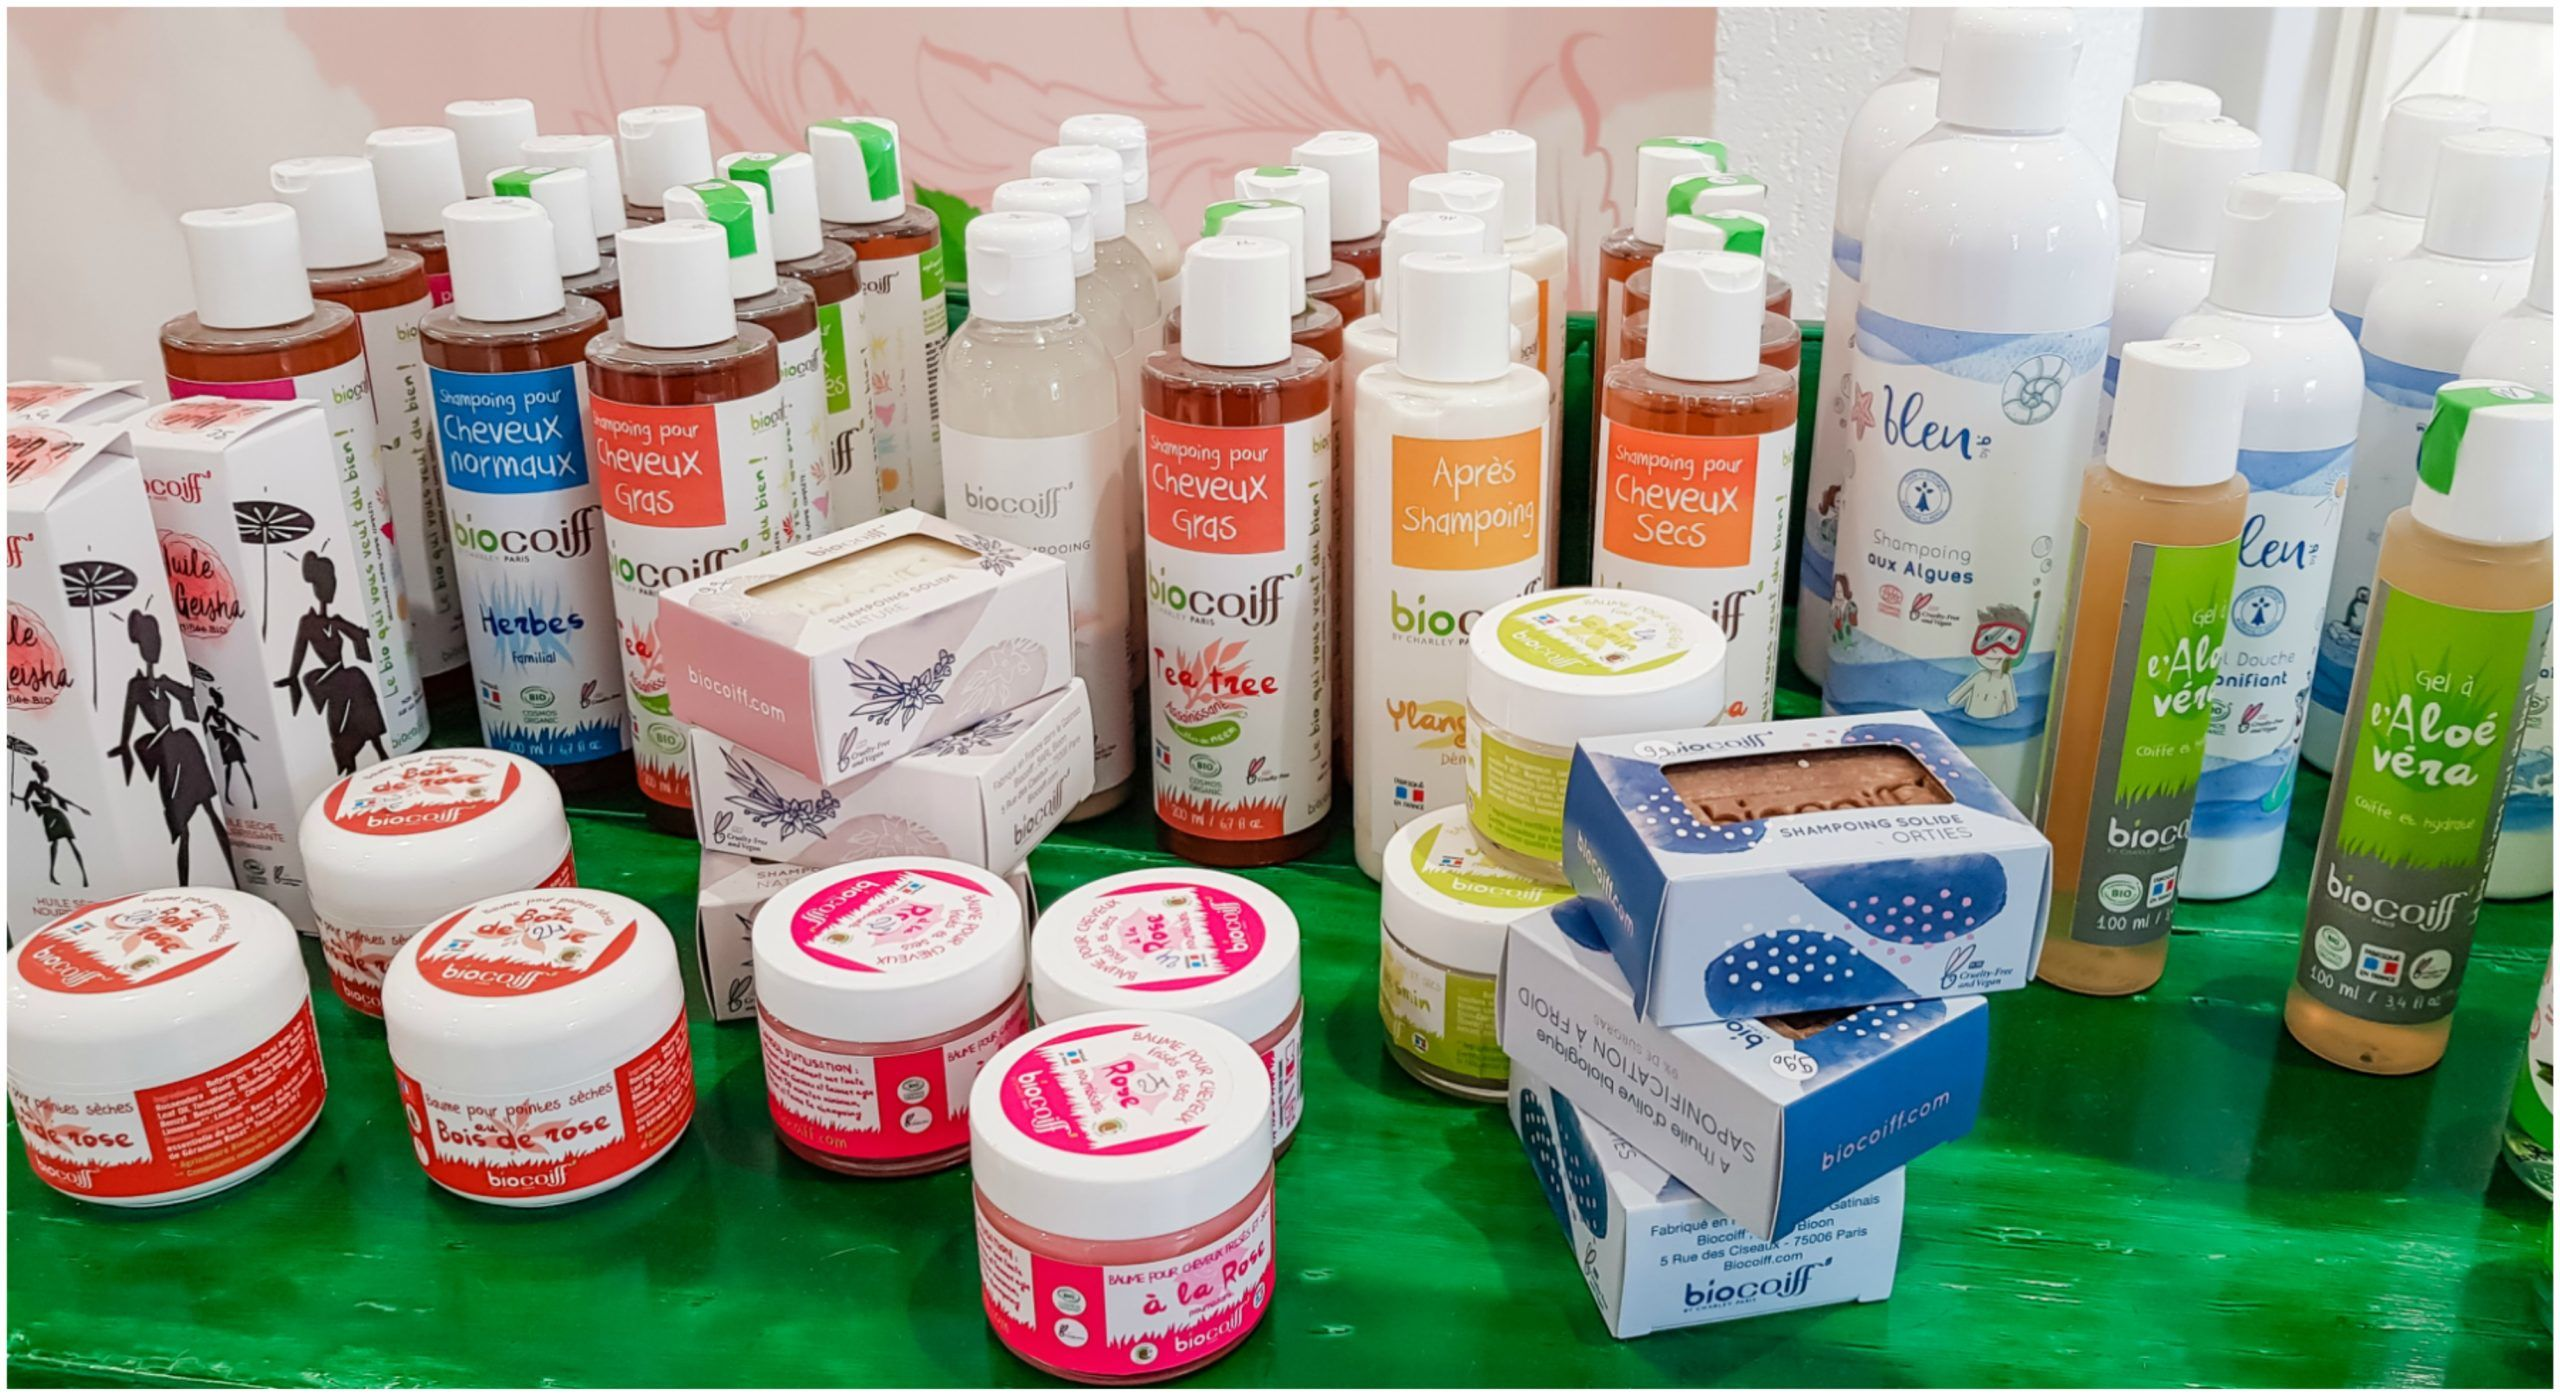 shampoing biocoiff evreux